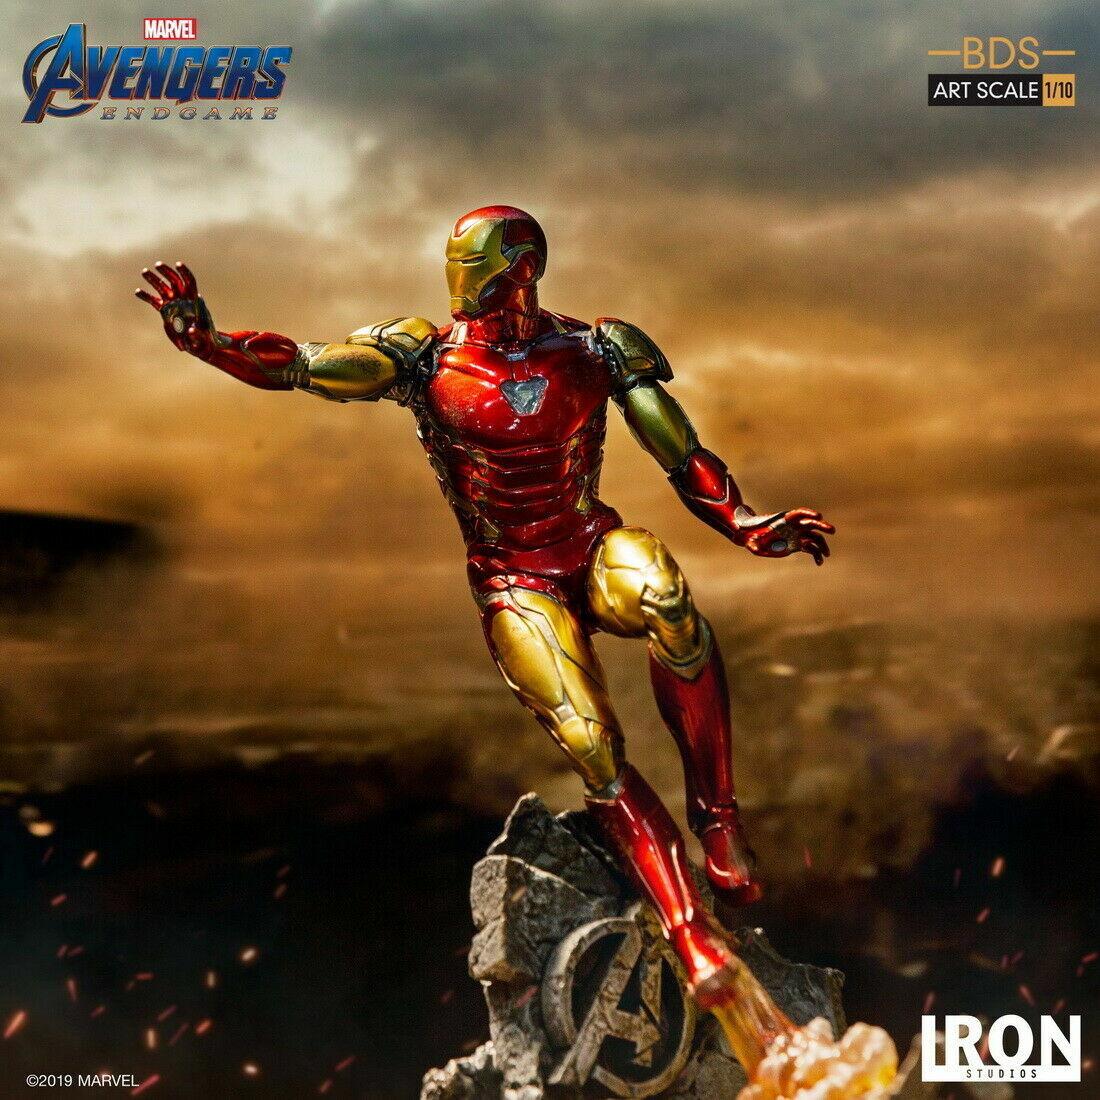 Iron Studios 1:10 Scale Iron Man MK85 Statue The Avengers End Game  on eBay thumbnail